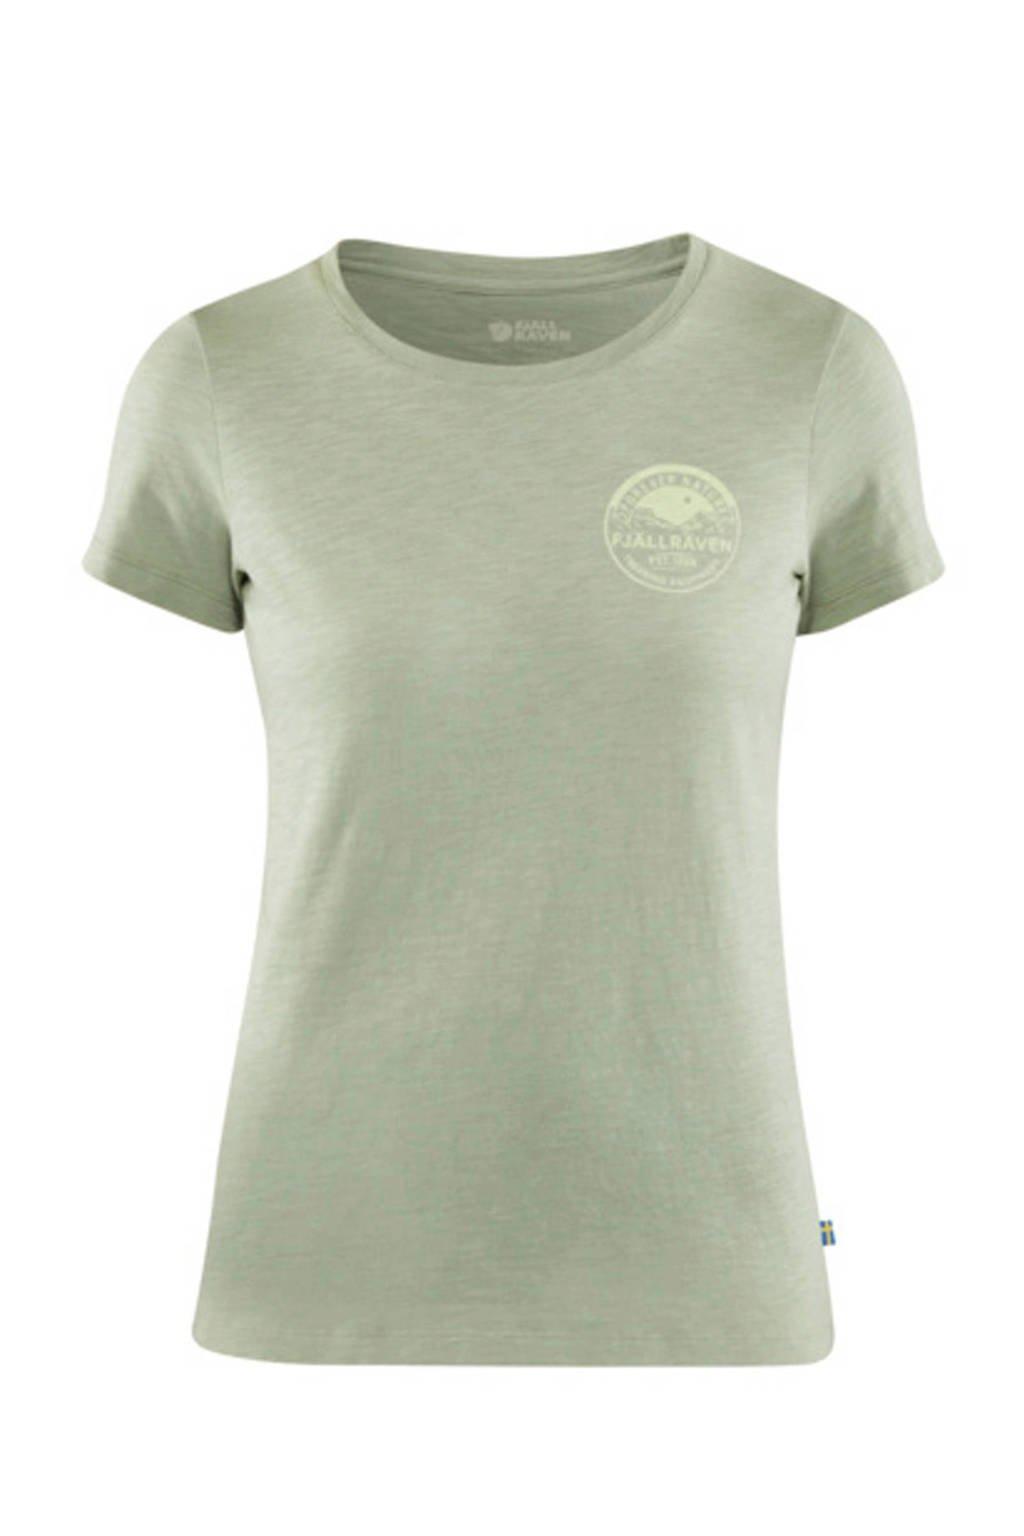 Fjällräven T-shirt Forever Nature groen, Sage Green